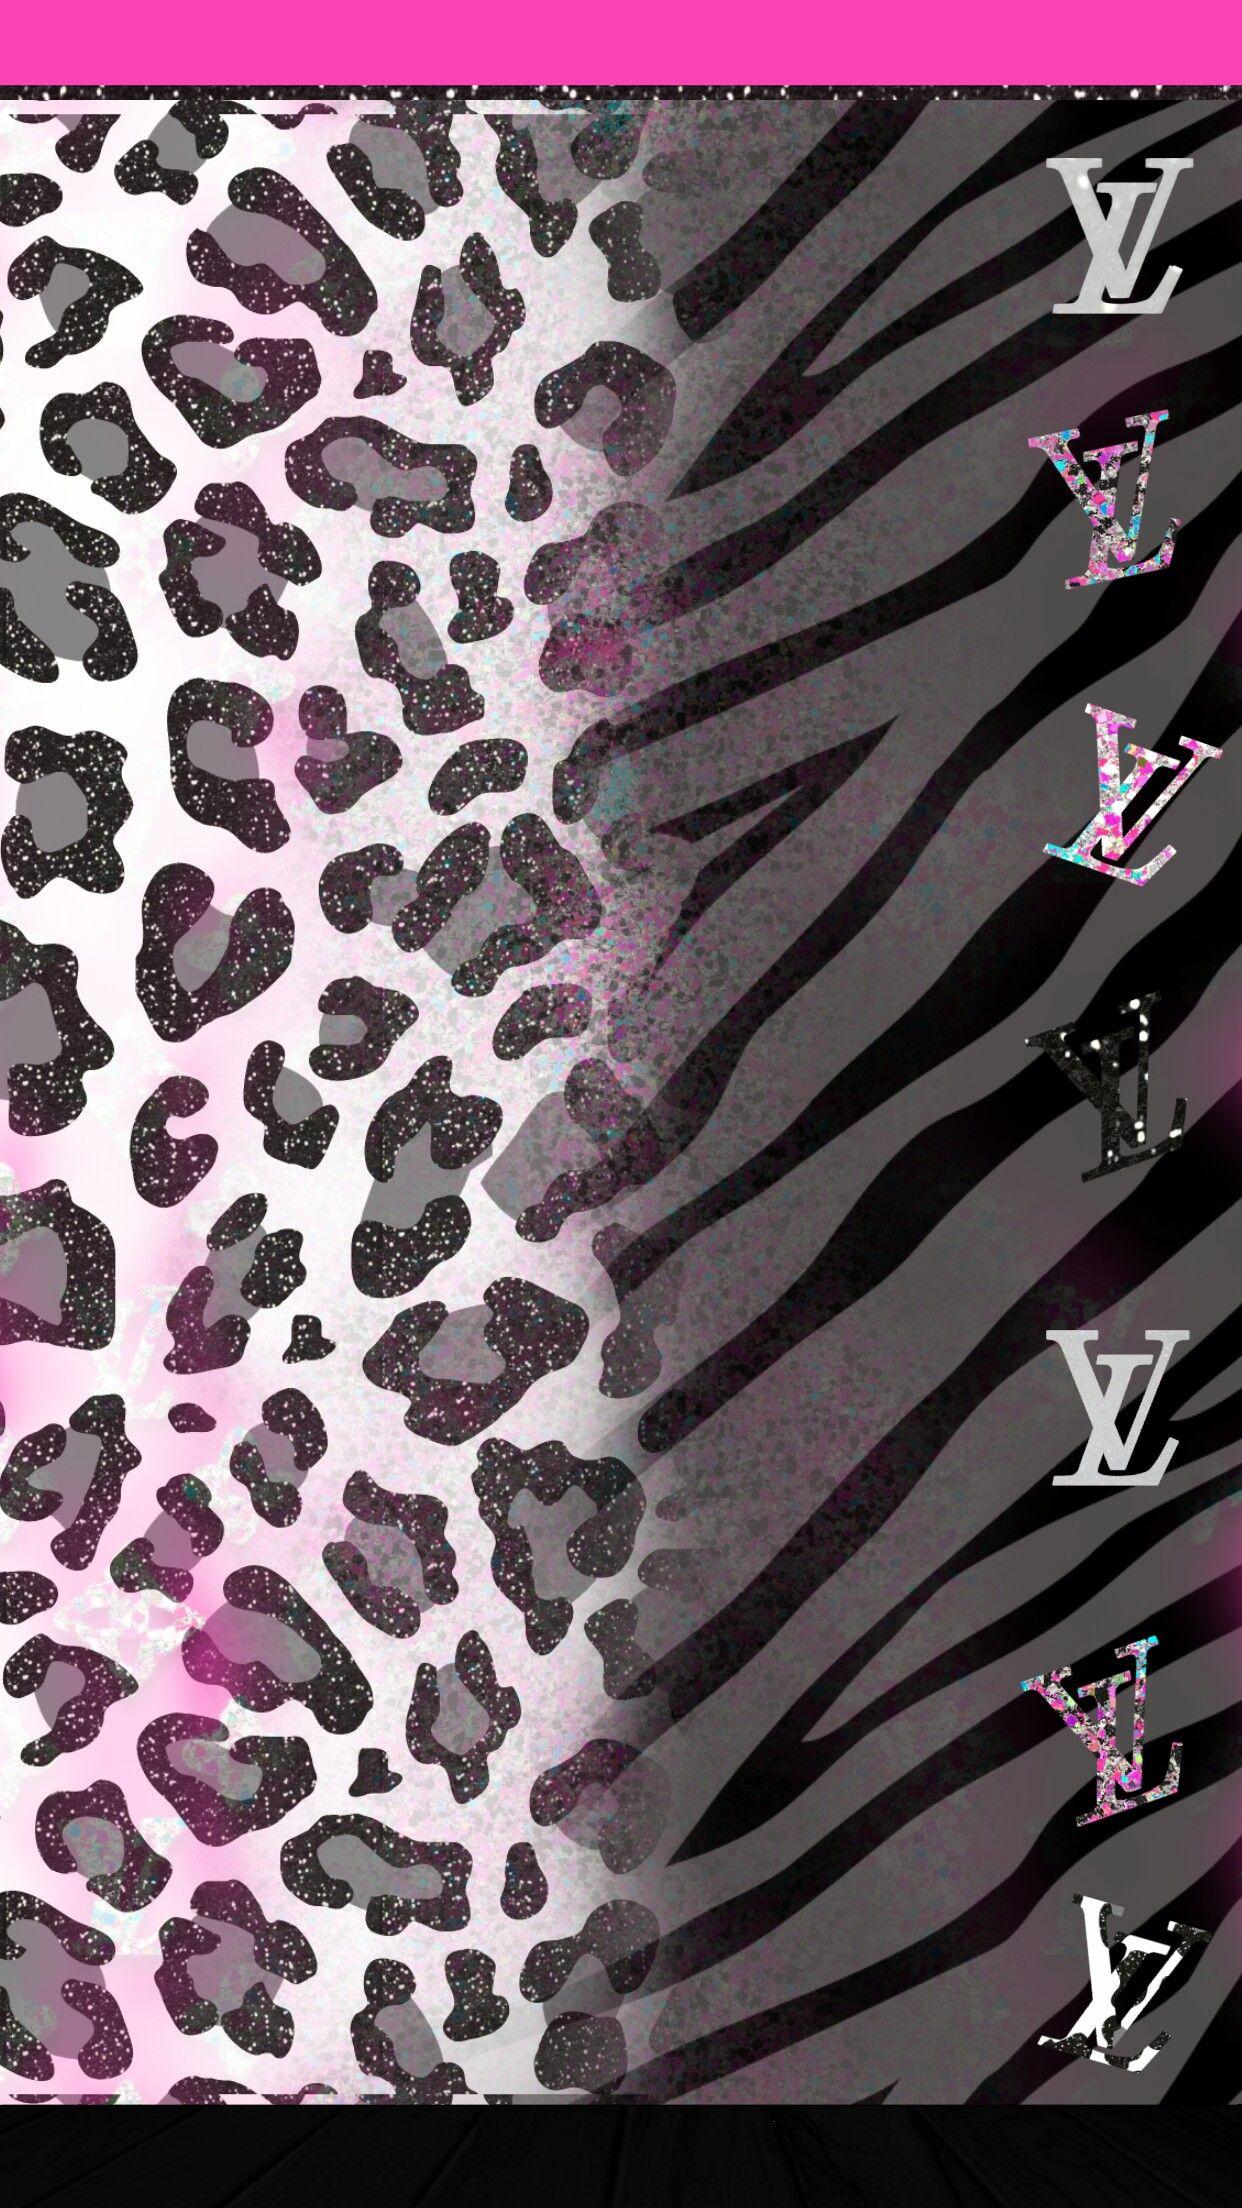 Download Wallpaper Hello Kitty Gray - 1b6e6a841e6b291ddec6d3d9fd3182bf  Collection_475858.jpg